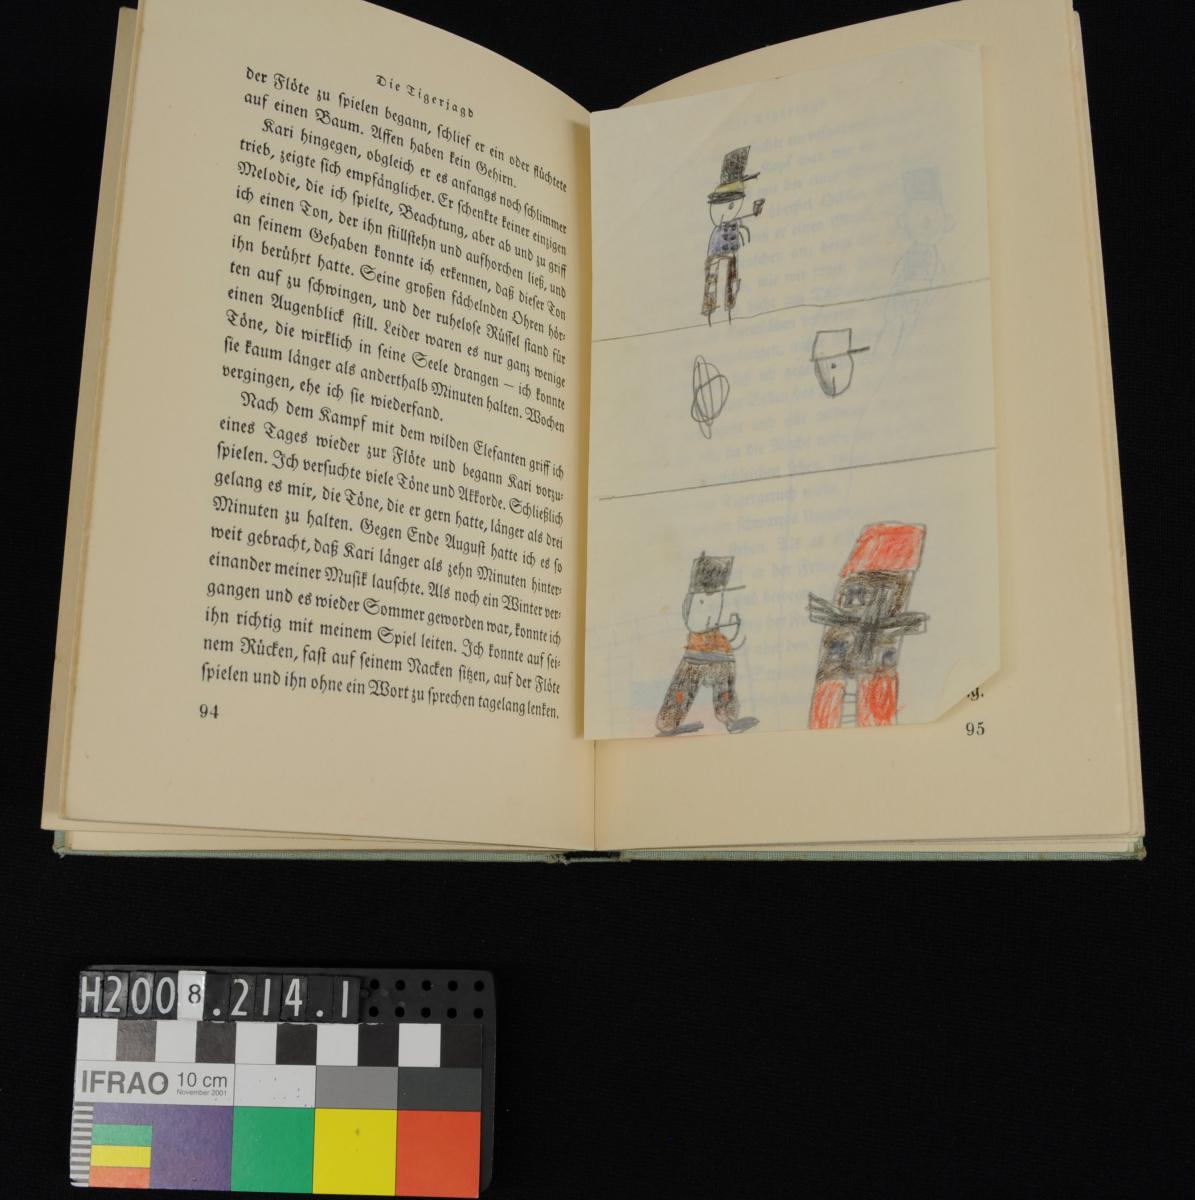 BOOK, child's, 'KARI/ DER/ ELEFANT'